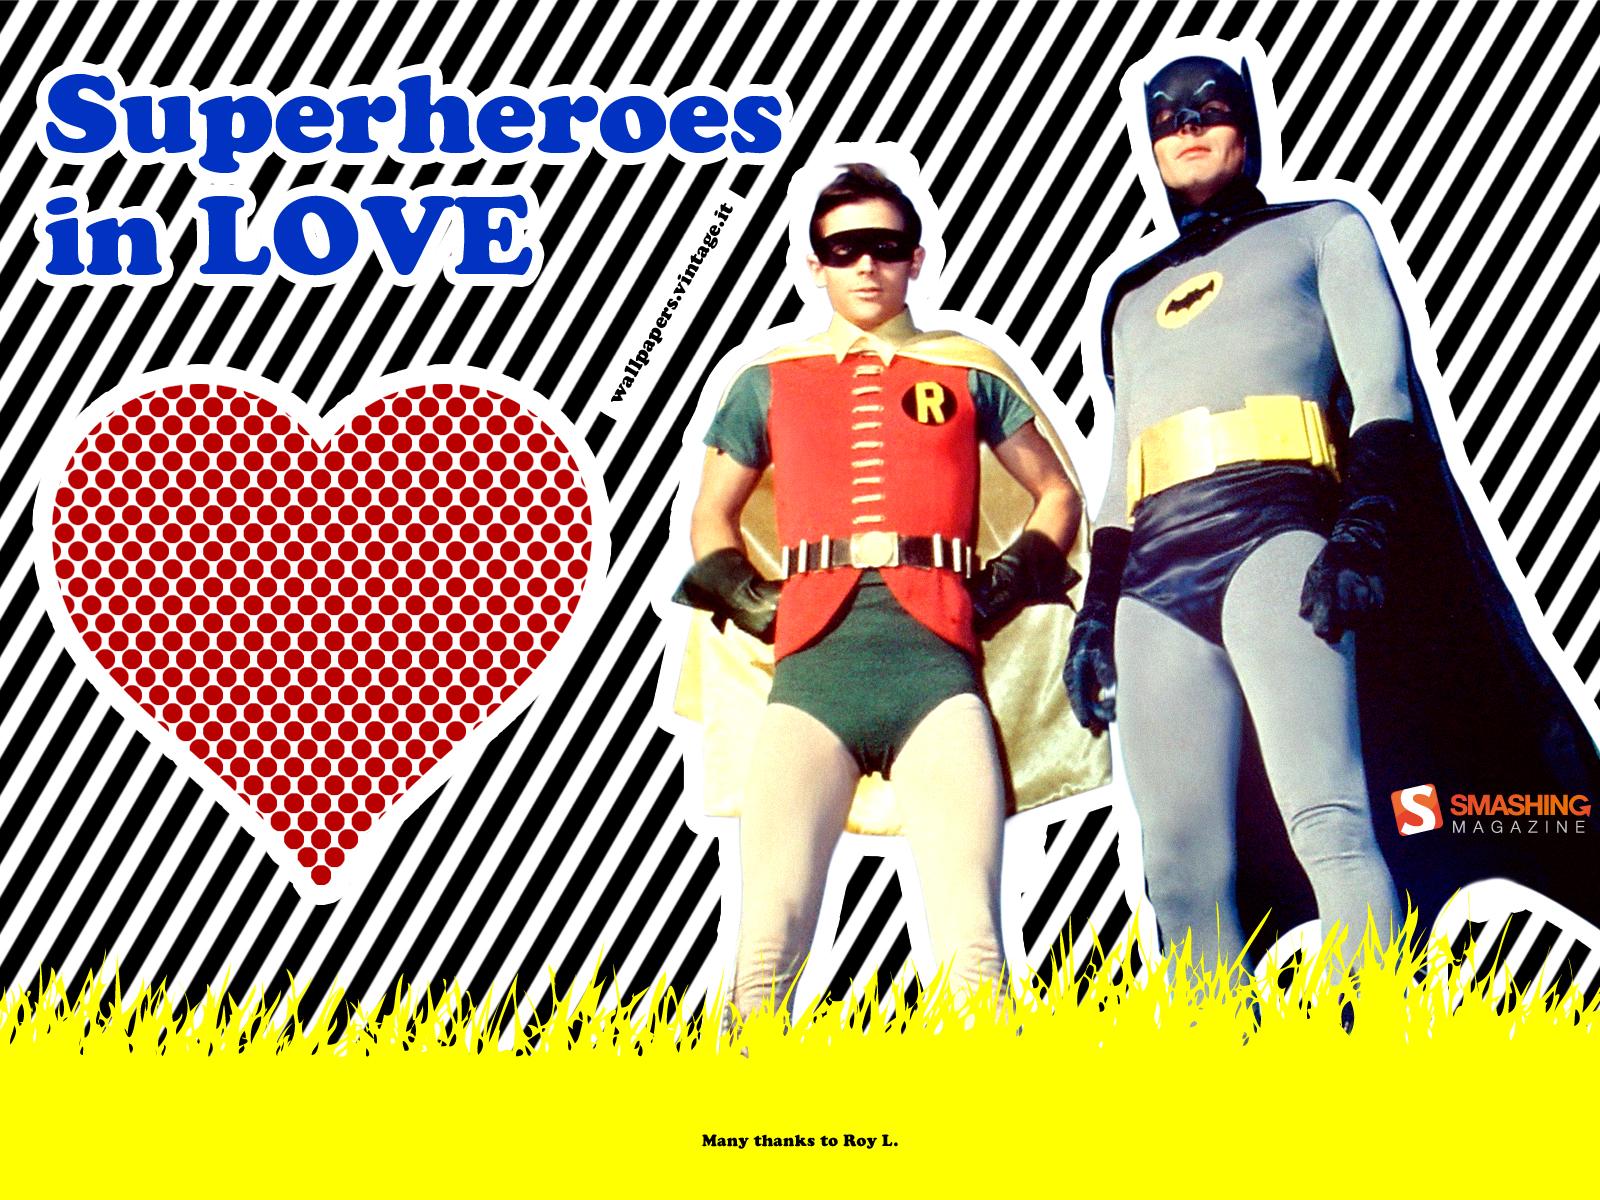 Superheroes in love Batman and Robin wallpaper 1600x1200jpg 1600x1200